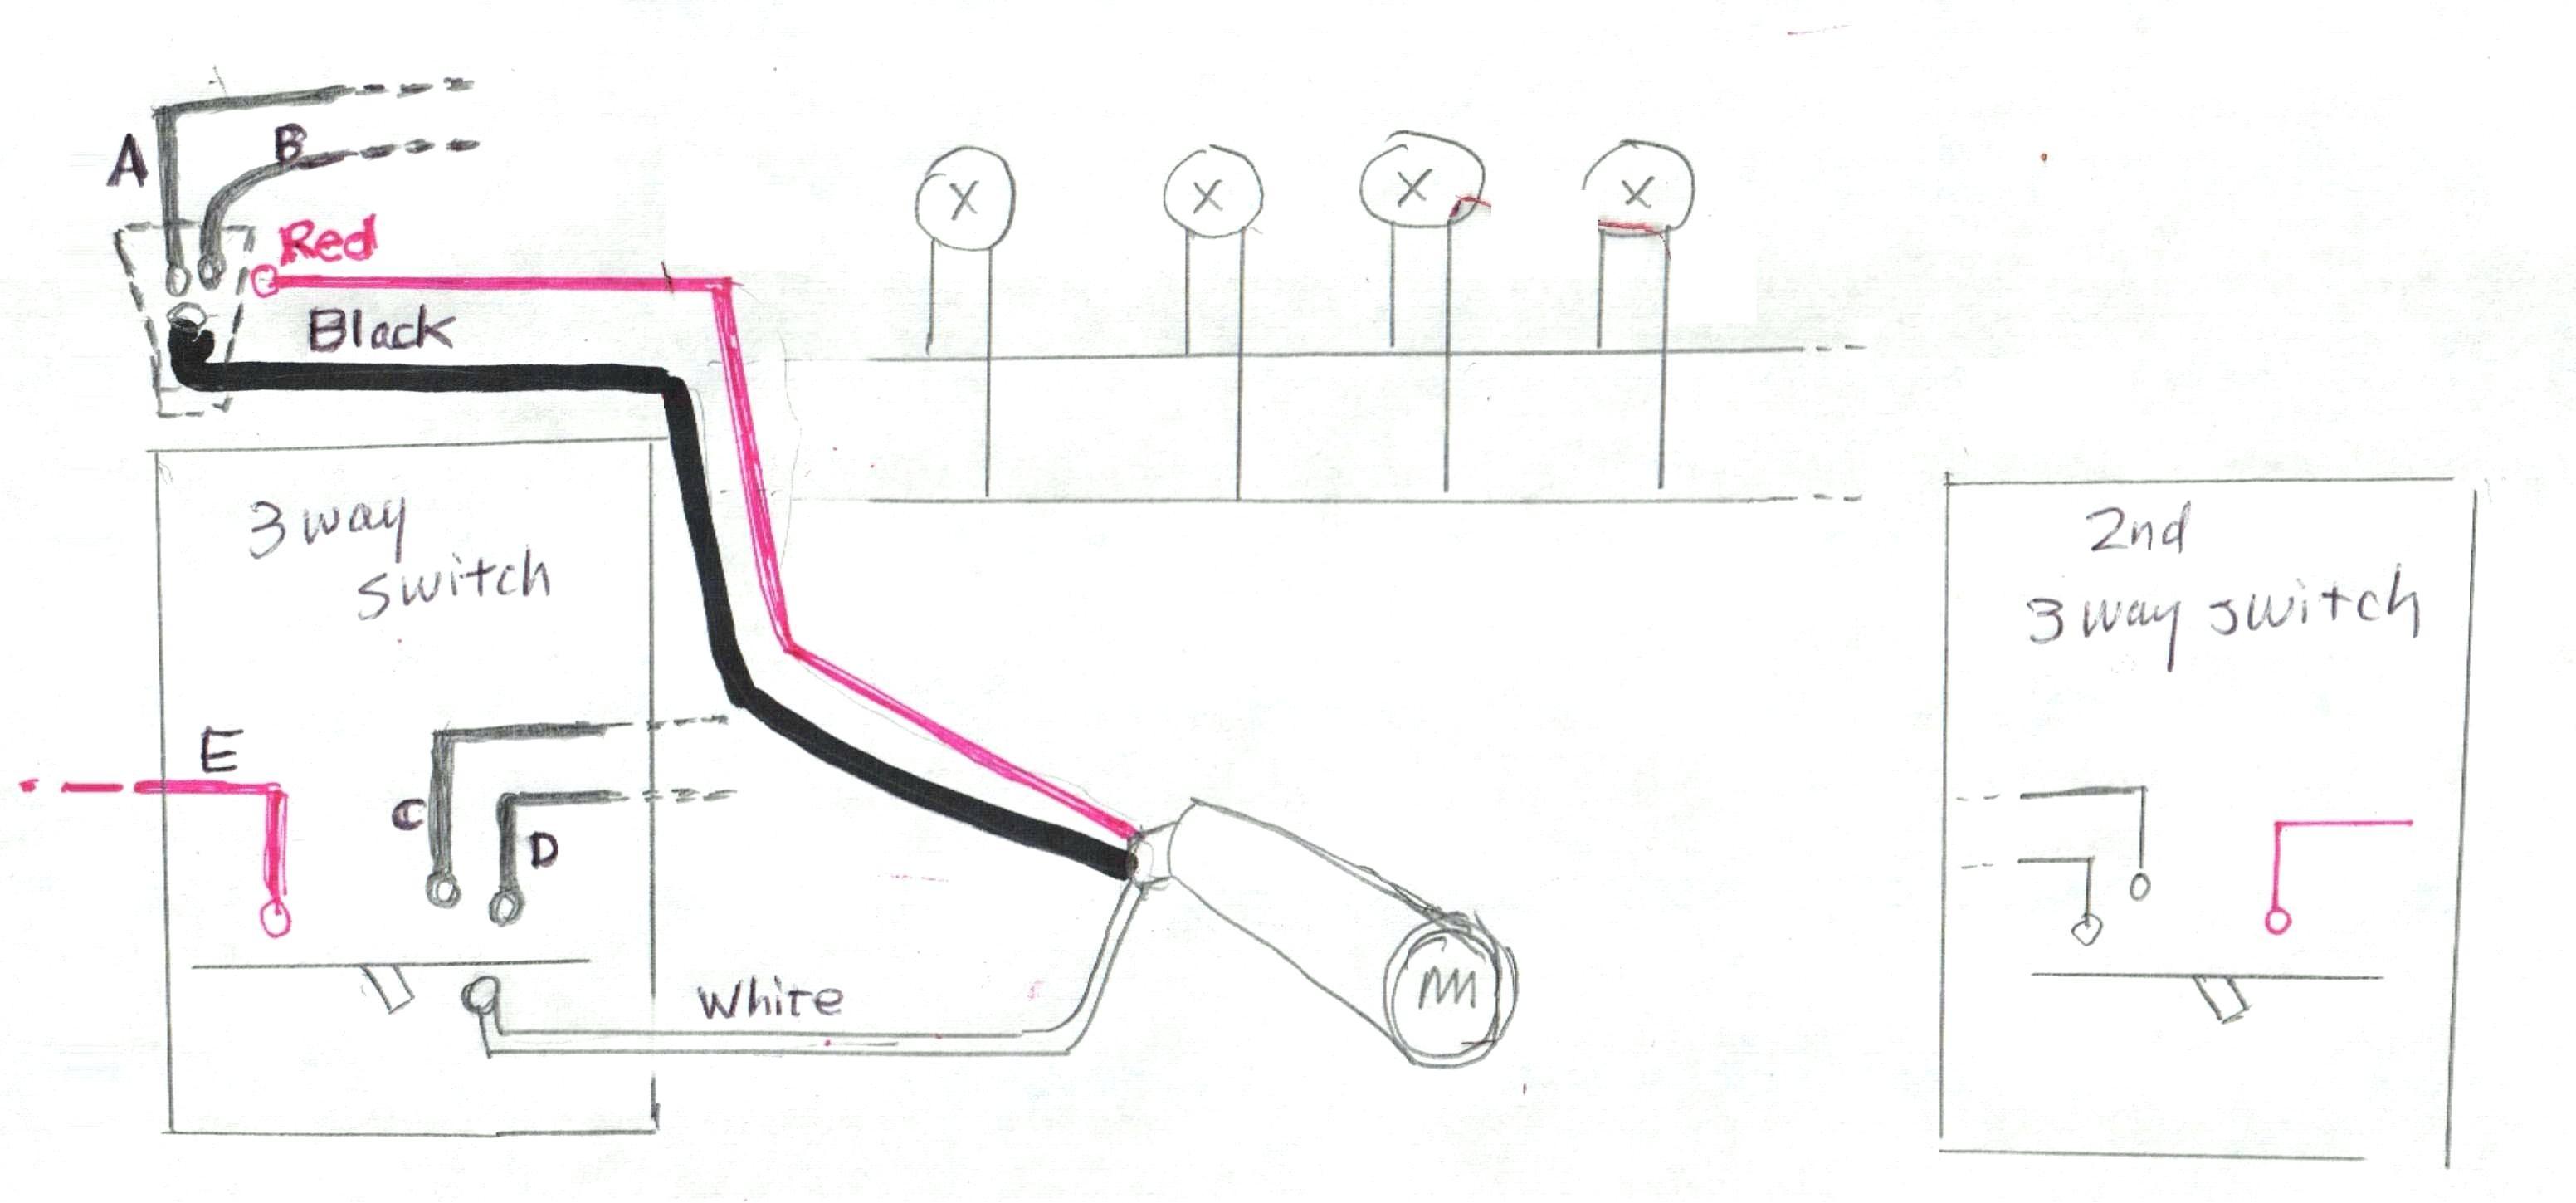 Switch Wiring Diagram Car Library Lionel Schematics Plc Alarm Auto Electrical Automotive Hazard Light